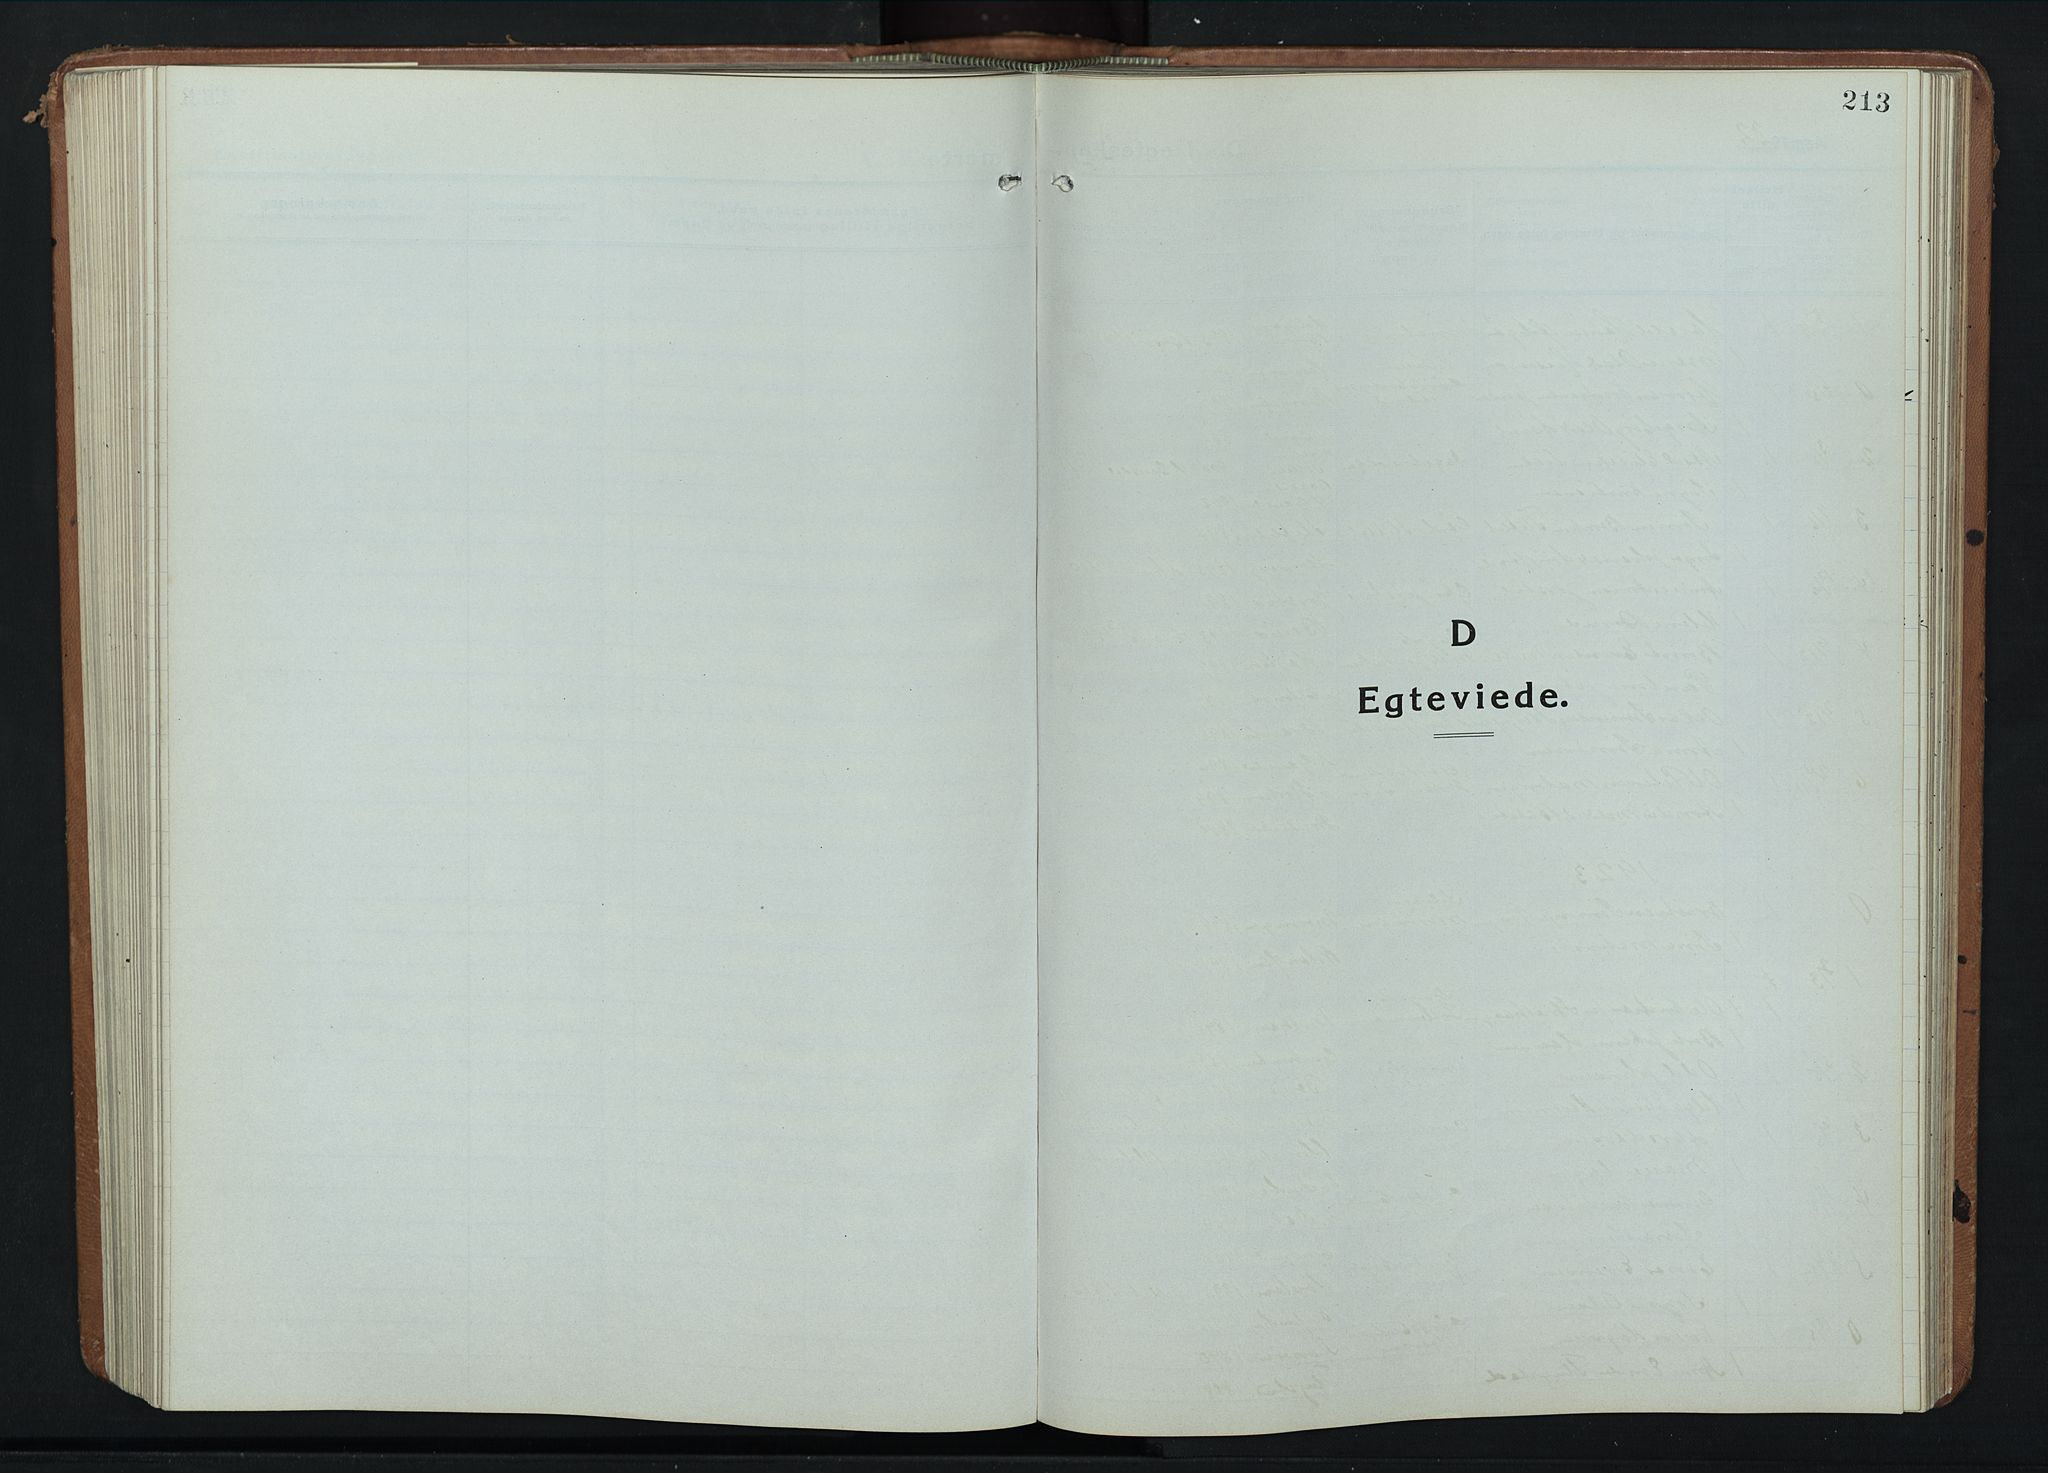 SAH, Fåberg prestekontor, Klokkerbok nr. 14, 1922-1946, s. 213